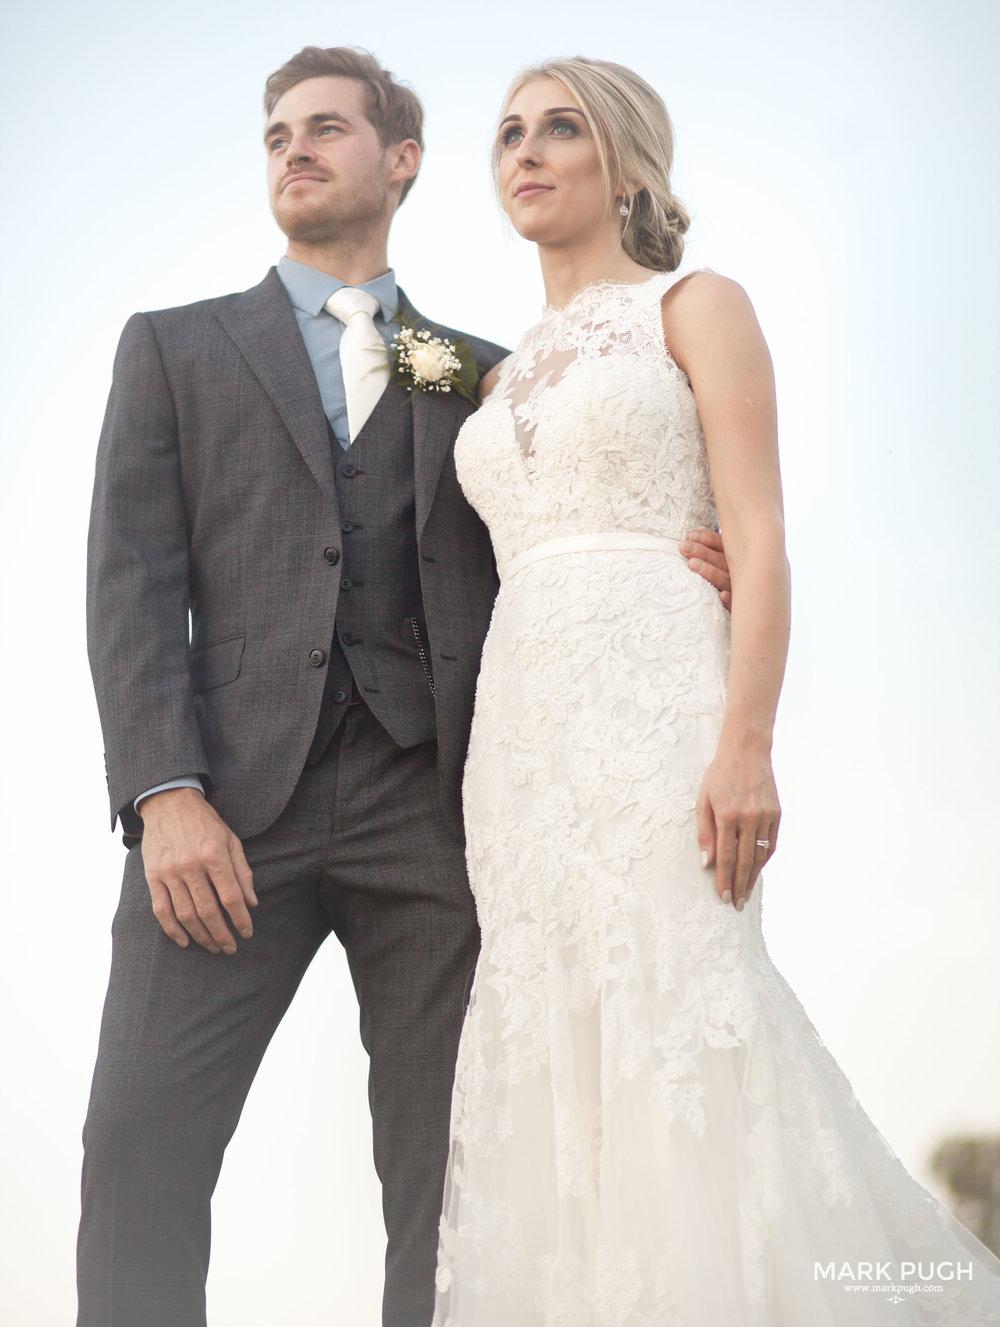 111 - Lucy and  Steven fineART wedding photography by www.markpugh.com Mark Pugh of www.mpmedia.co.uk_.JPG